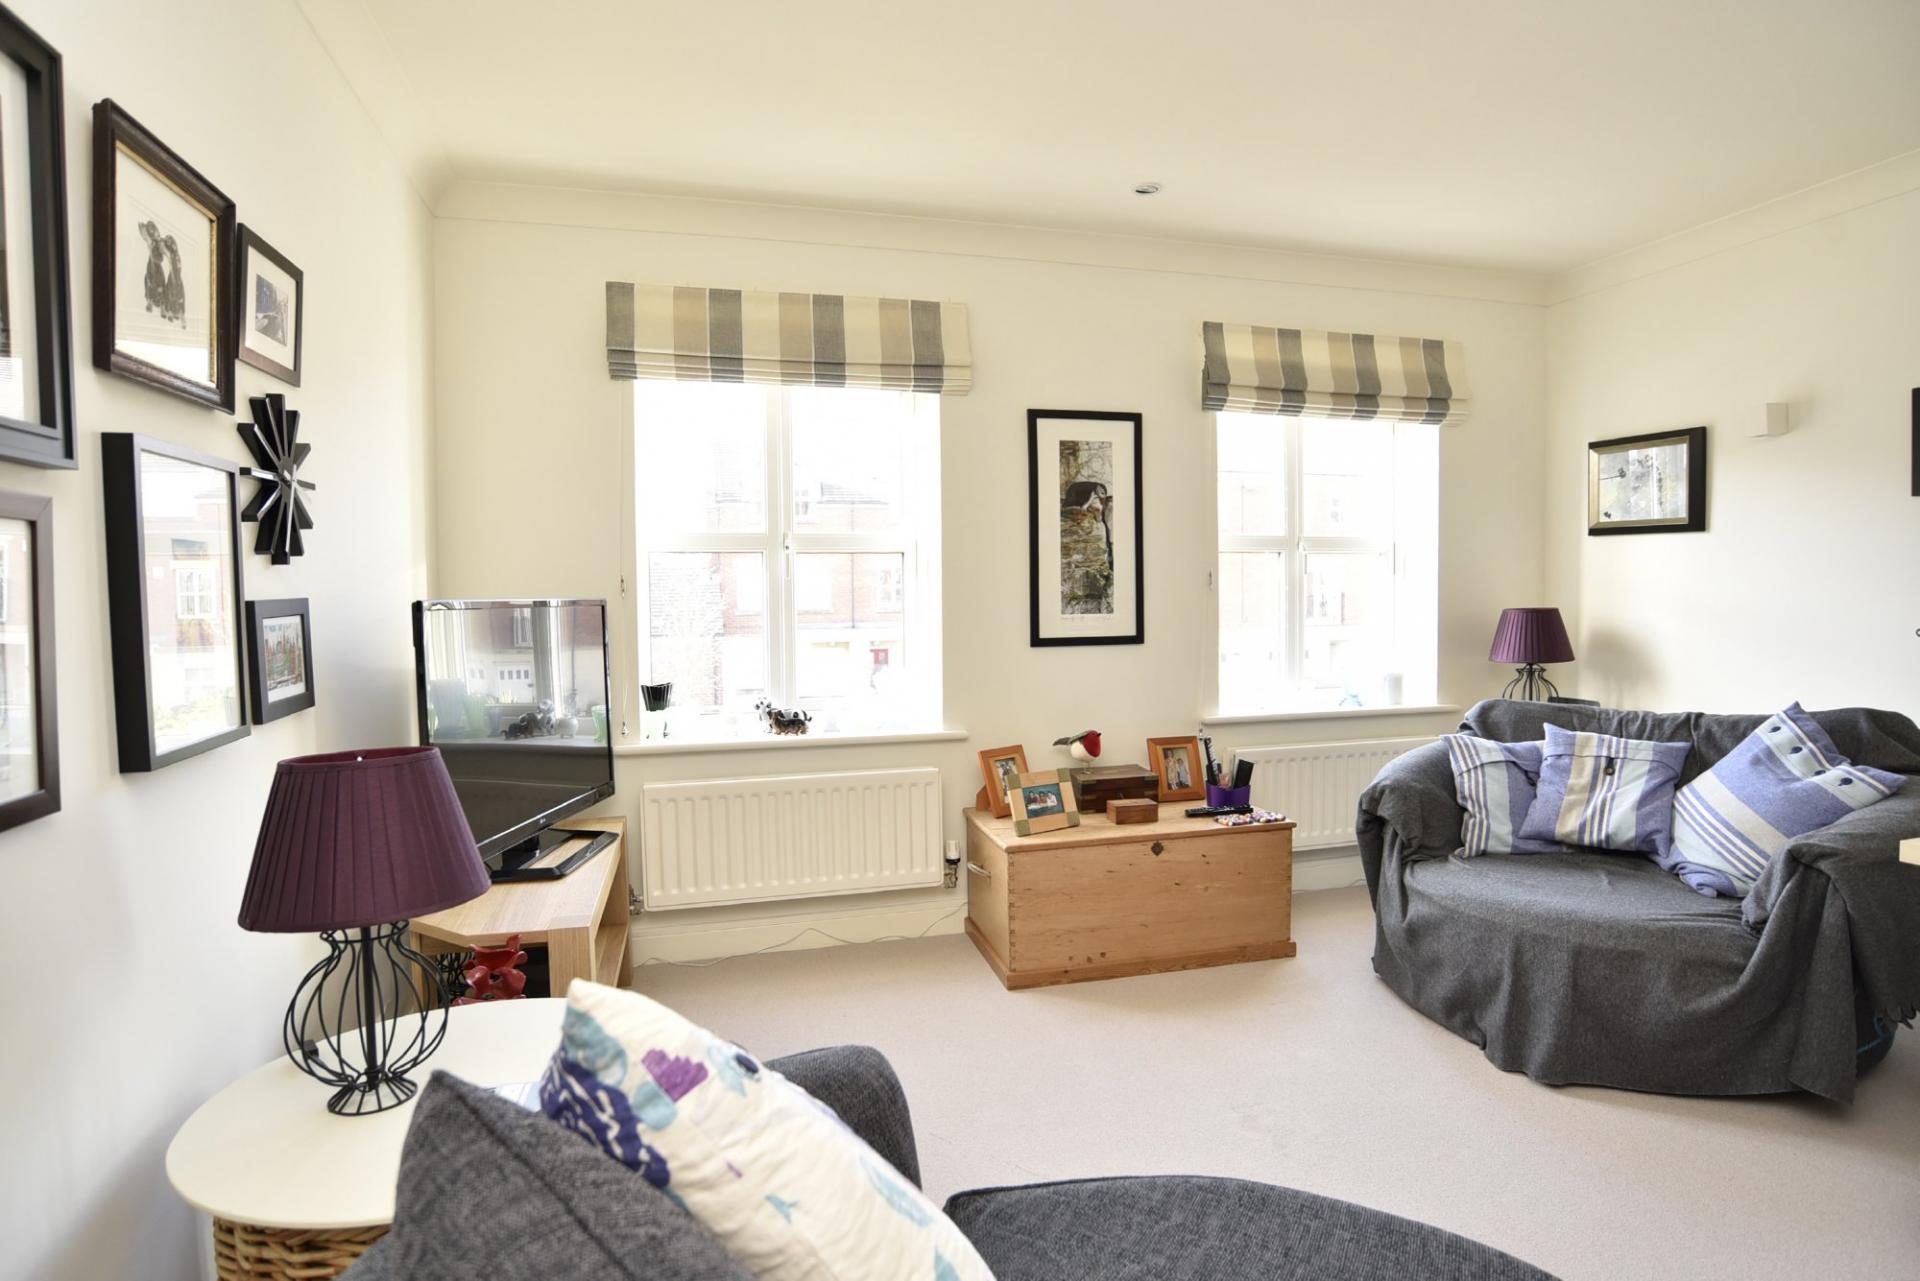 3 Bedroom Town House For Sale In Harrogate